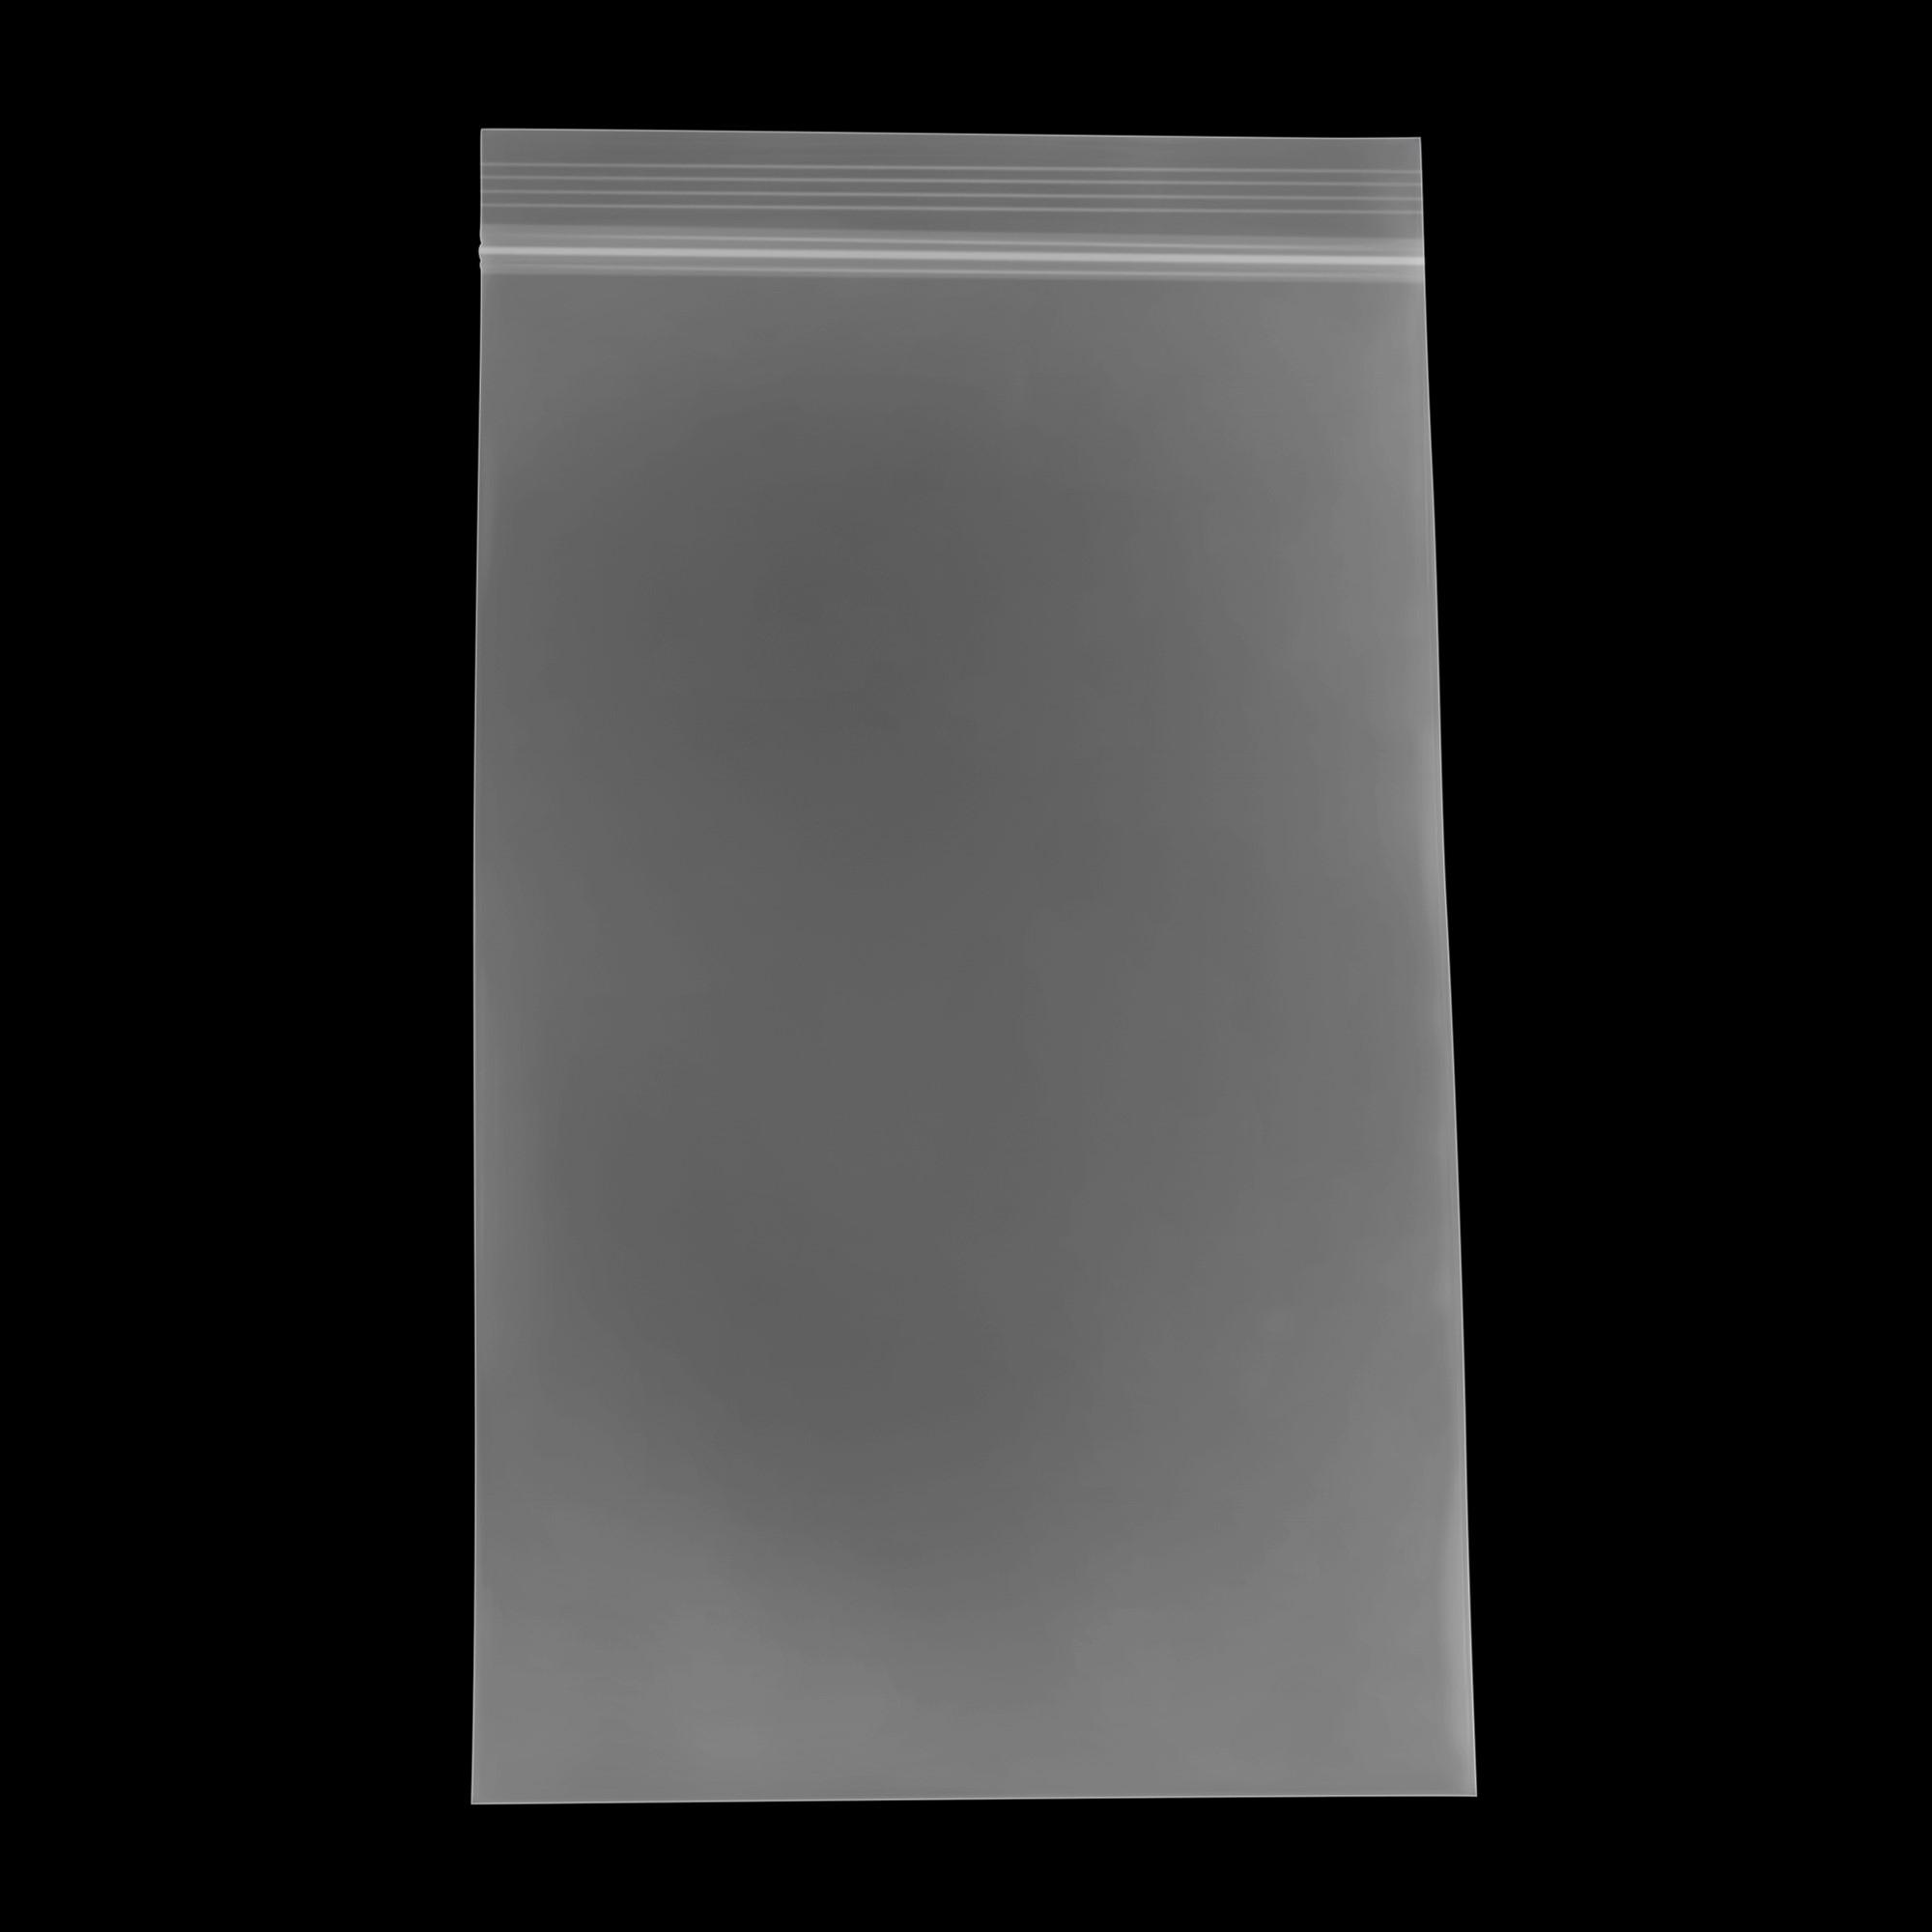 4 Mil Bauxko 18 x 20 White Block Reclosable Poly Bags 25-Pack x-PB4013-25